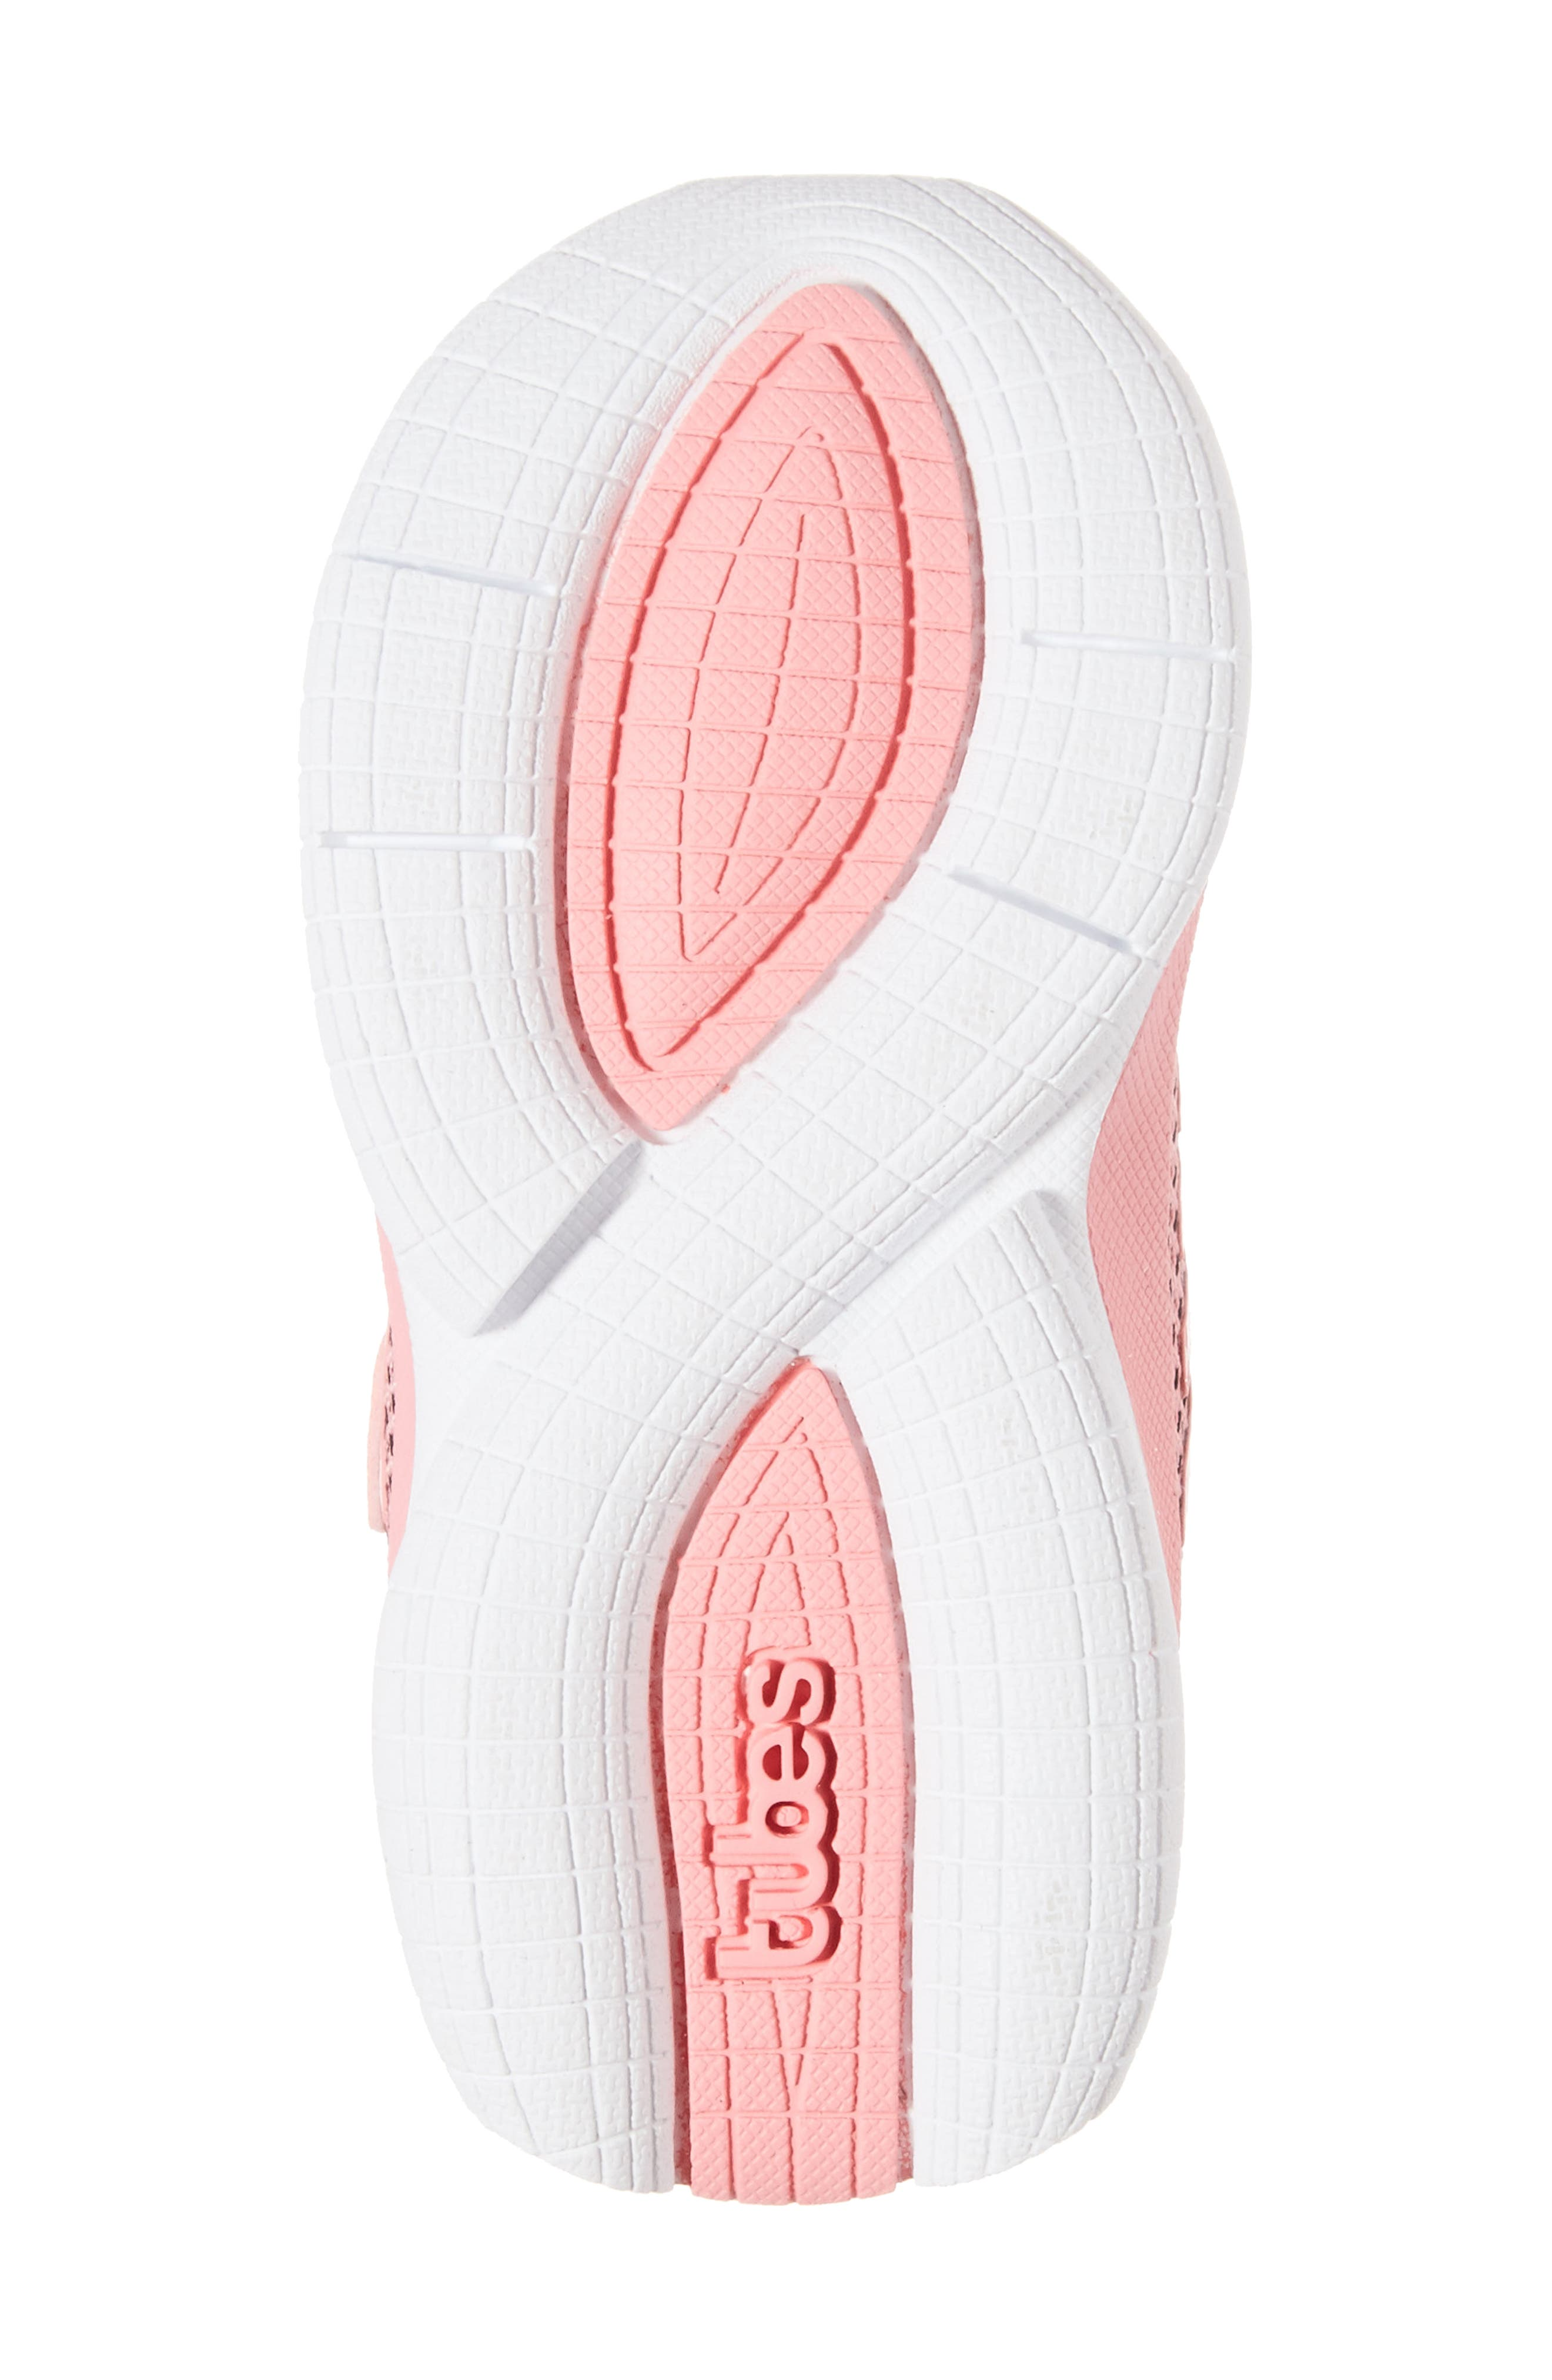 Tubes Infinity Sneaker,                             Alternate thumbnail 6, color,                             Flamingo Pink/ White